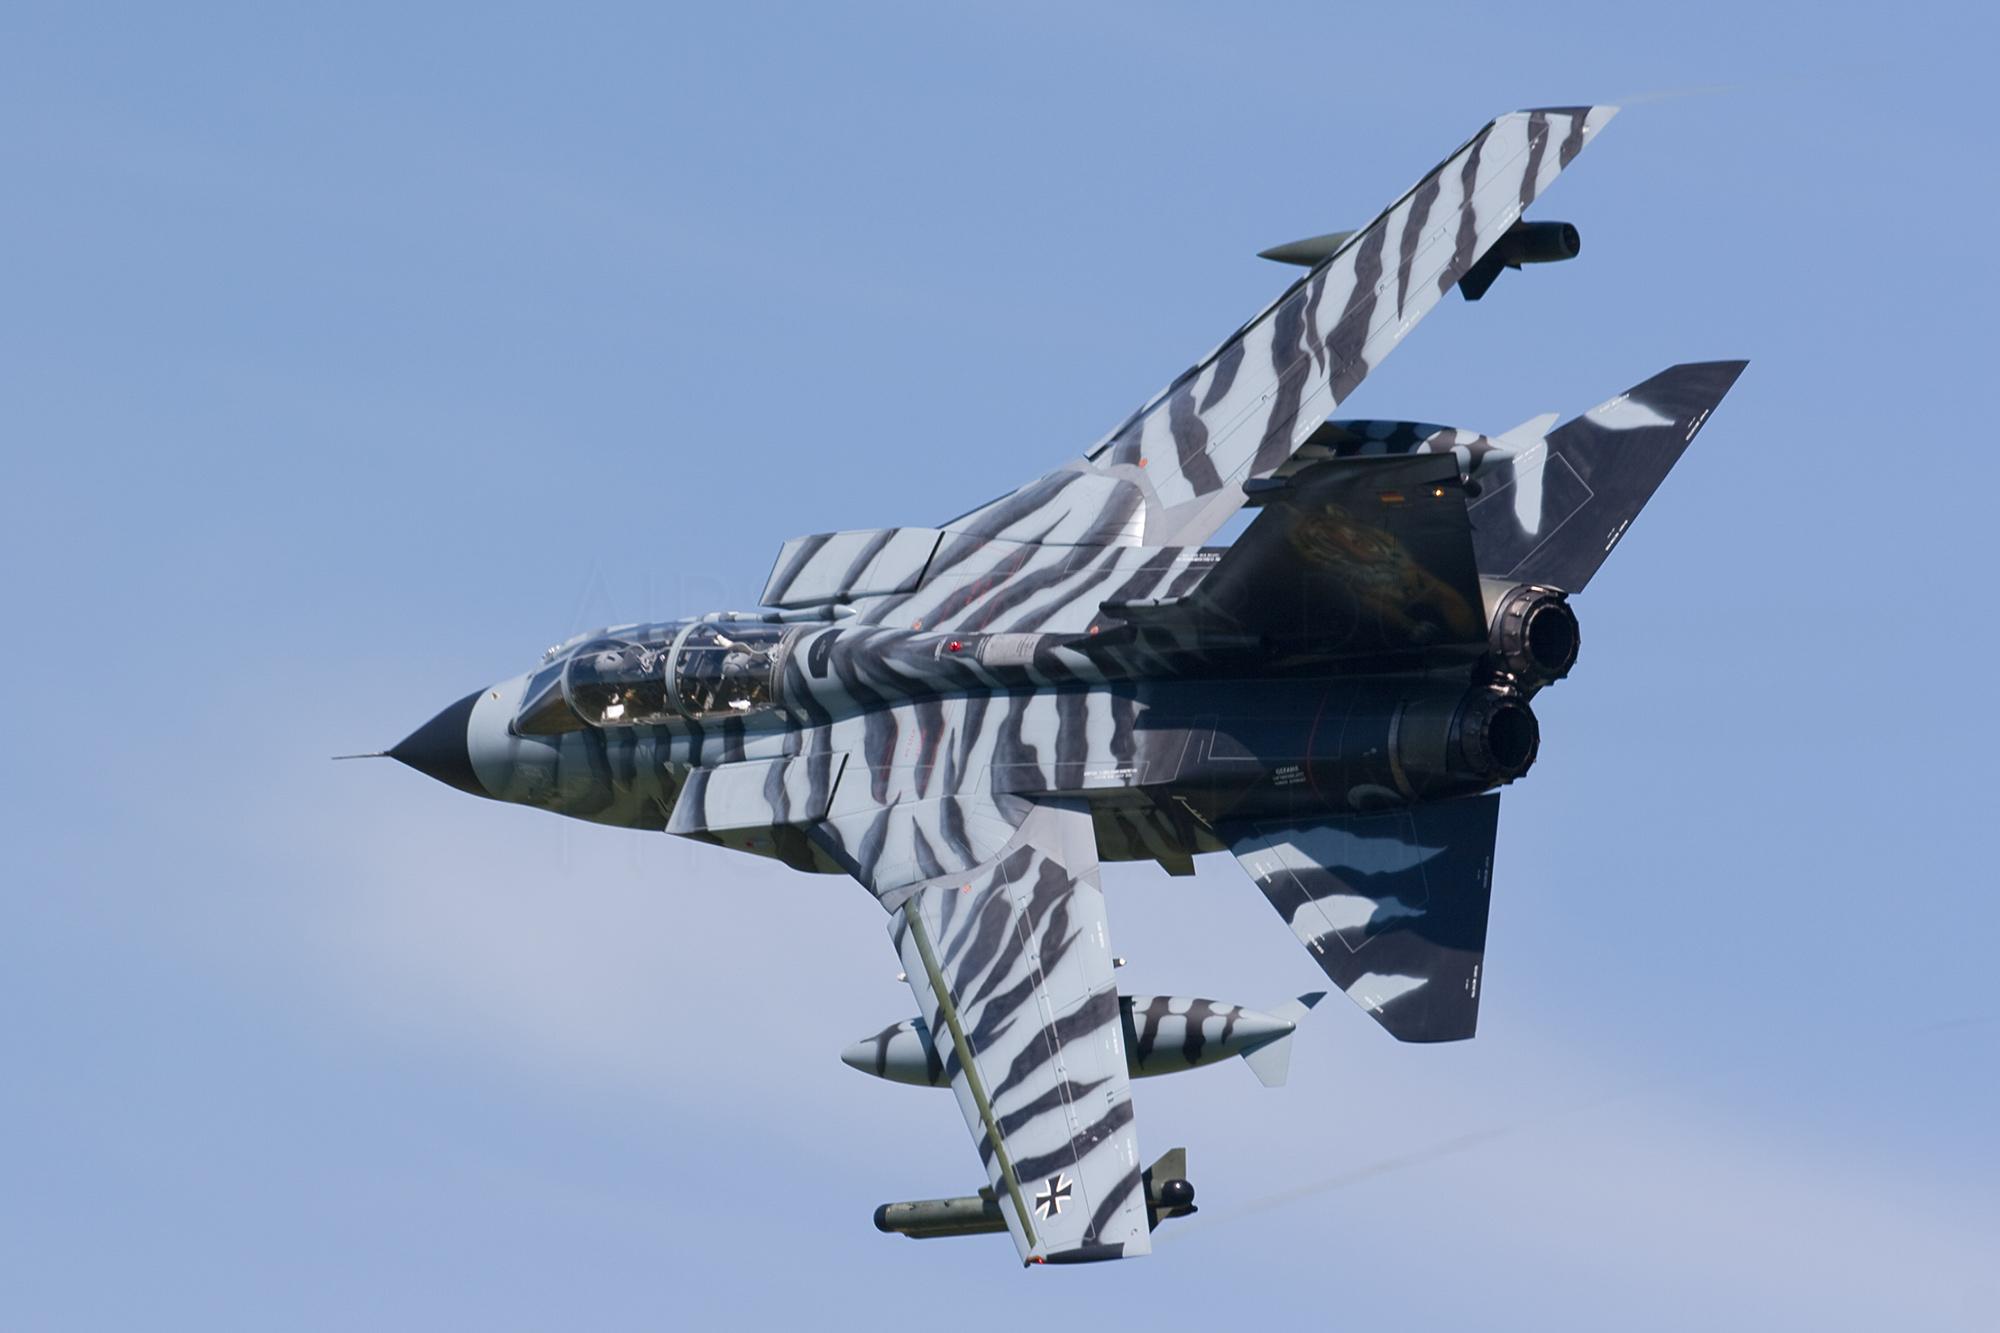 Airspotter.de 2008 Elite 321 Tigers Tornado ECR